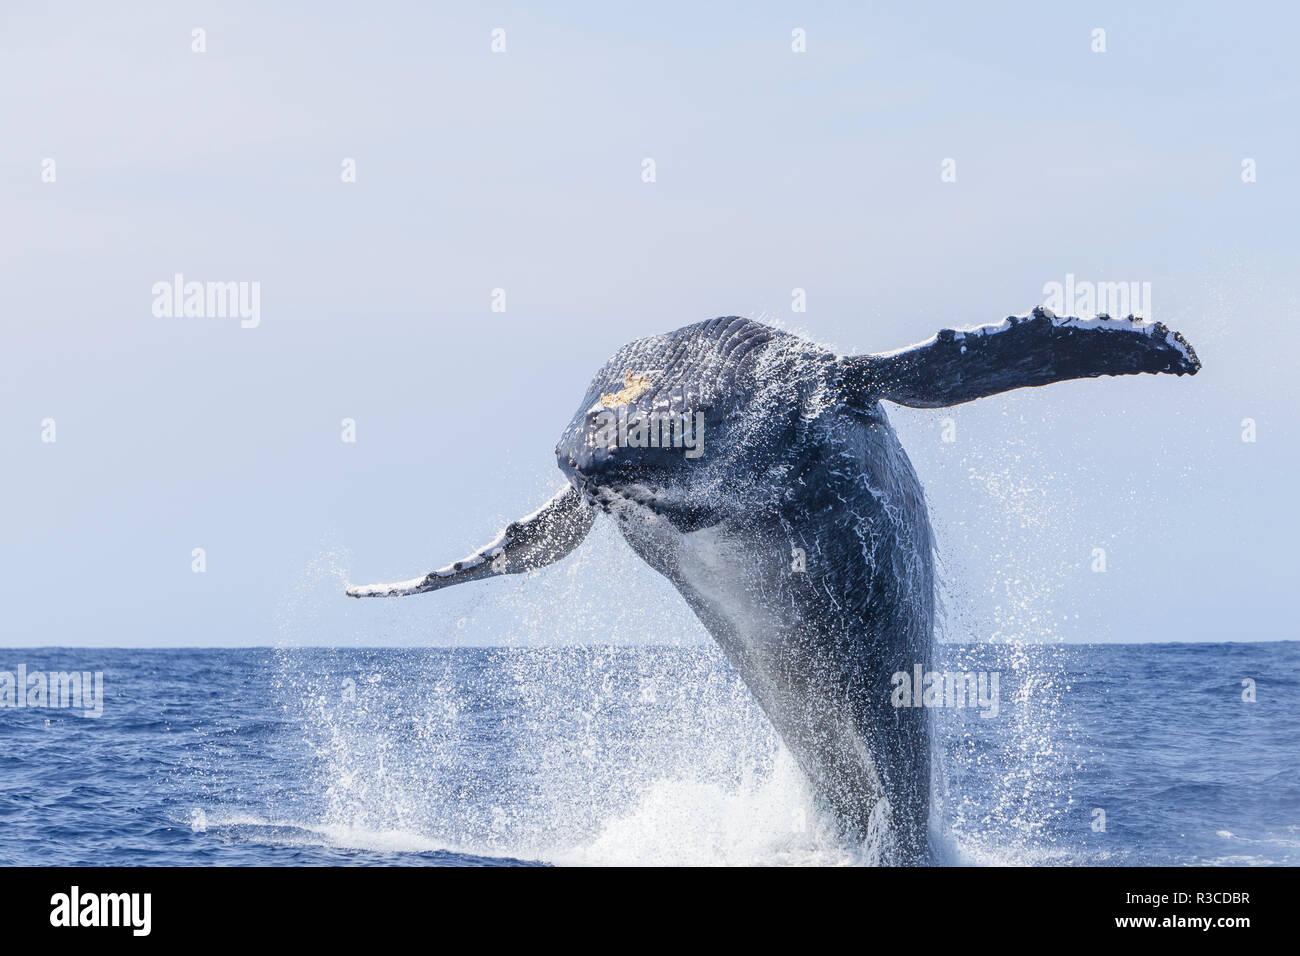 Humpback Whales (Megaptera novaeangliae), near Kona, Big Island, Hawaii - Stock Image